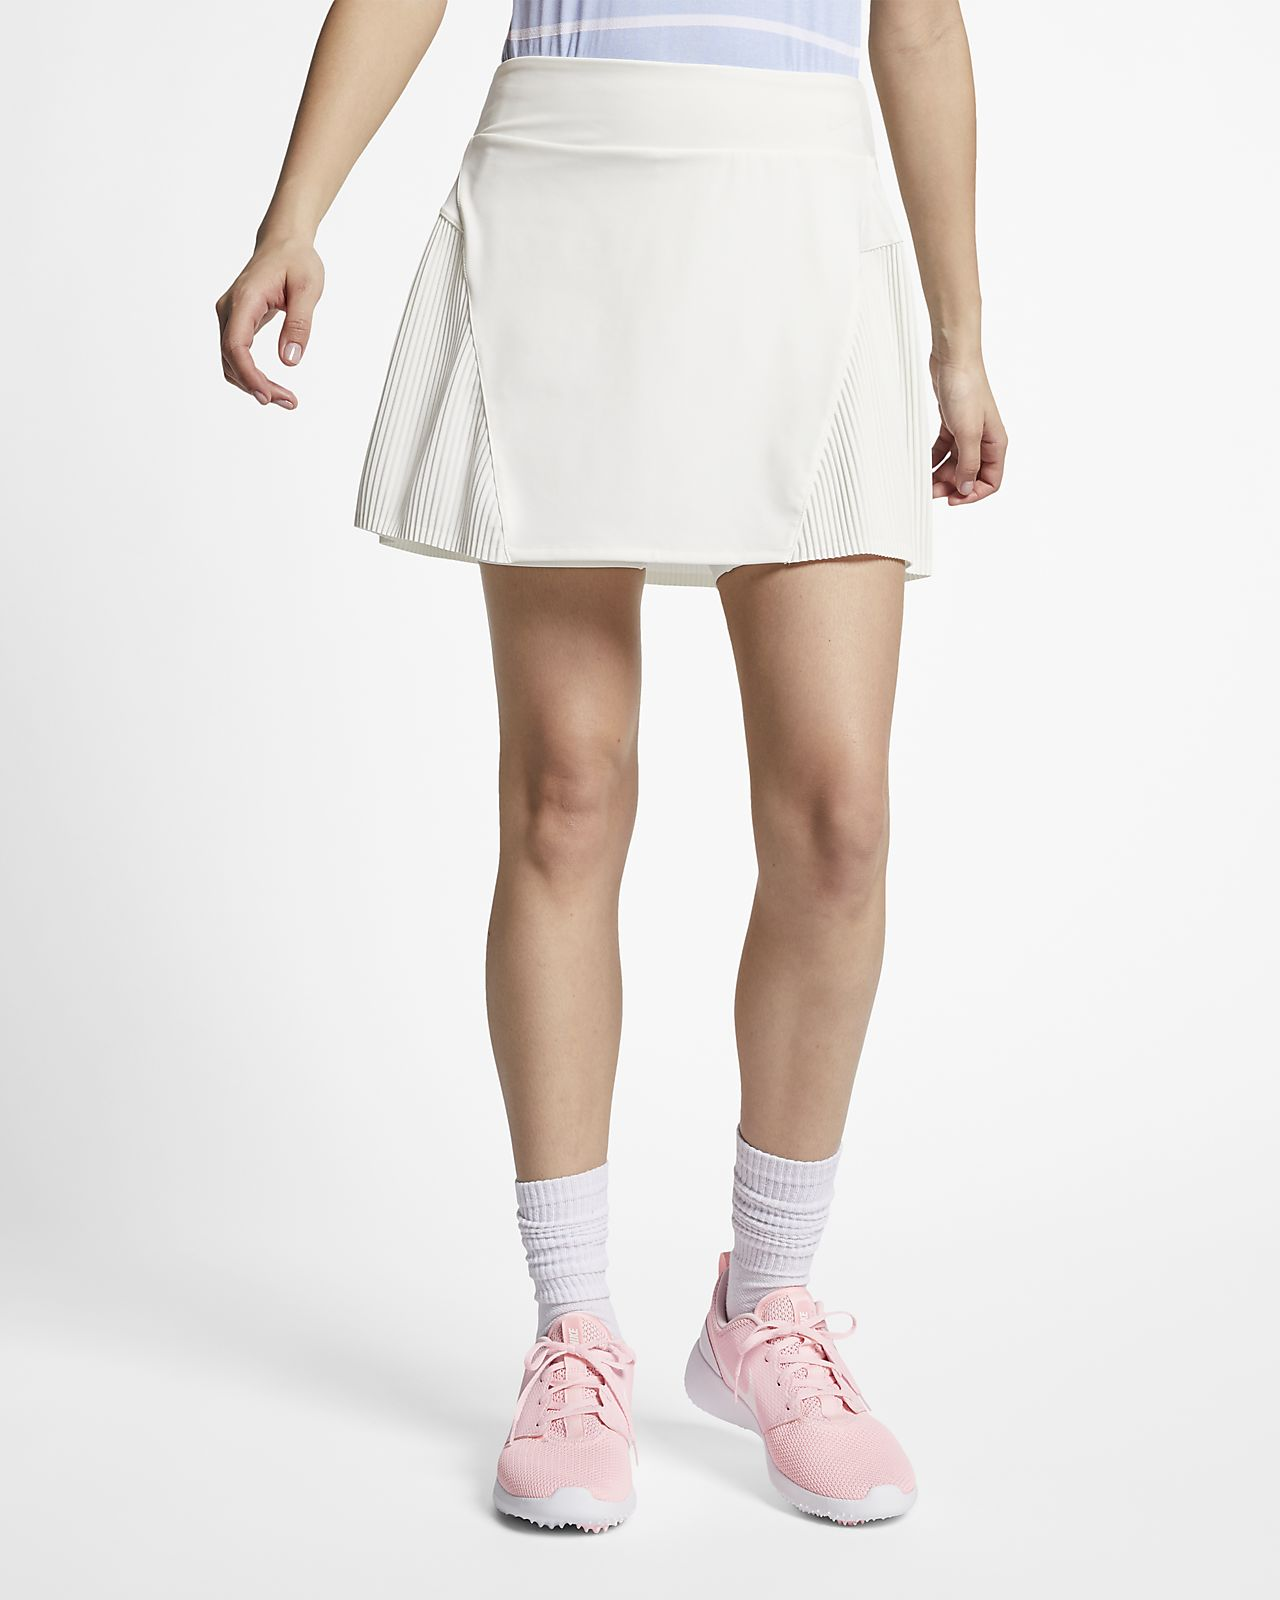 Юбка для гольфа Nike Dri-FIT 38 см